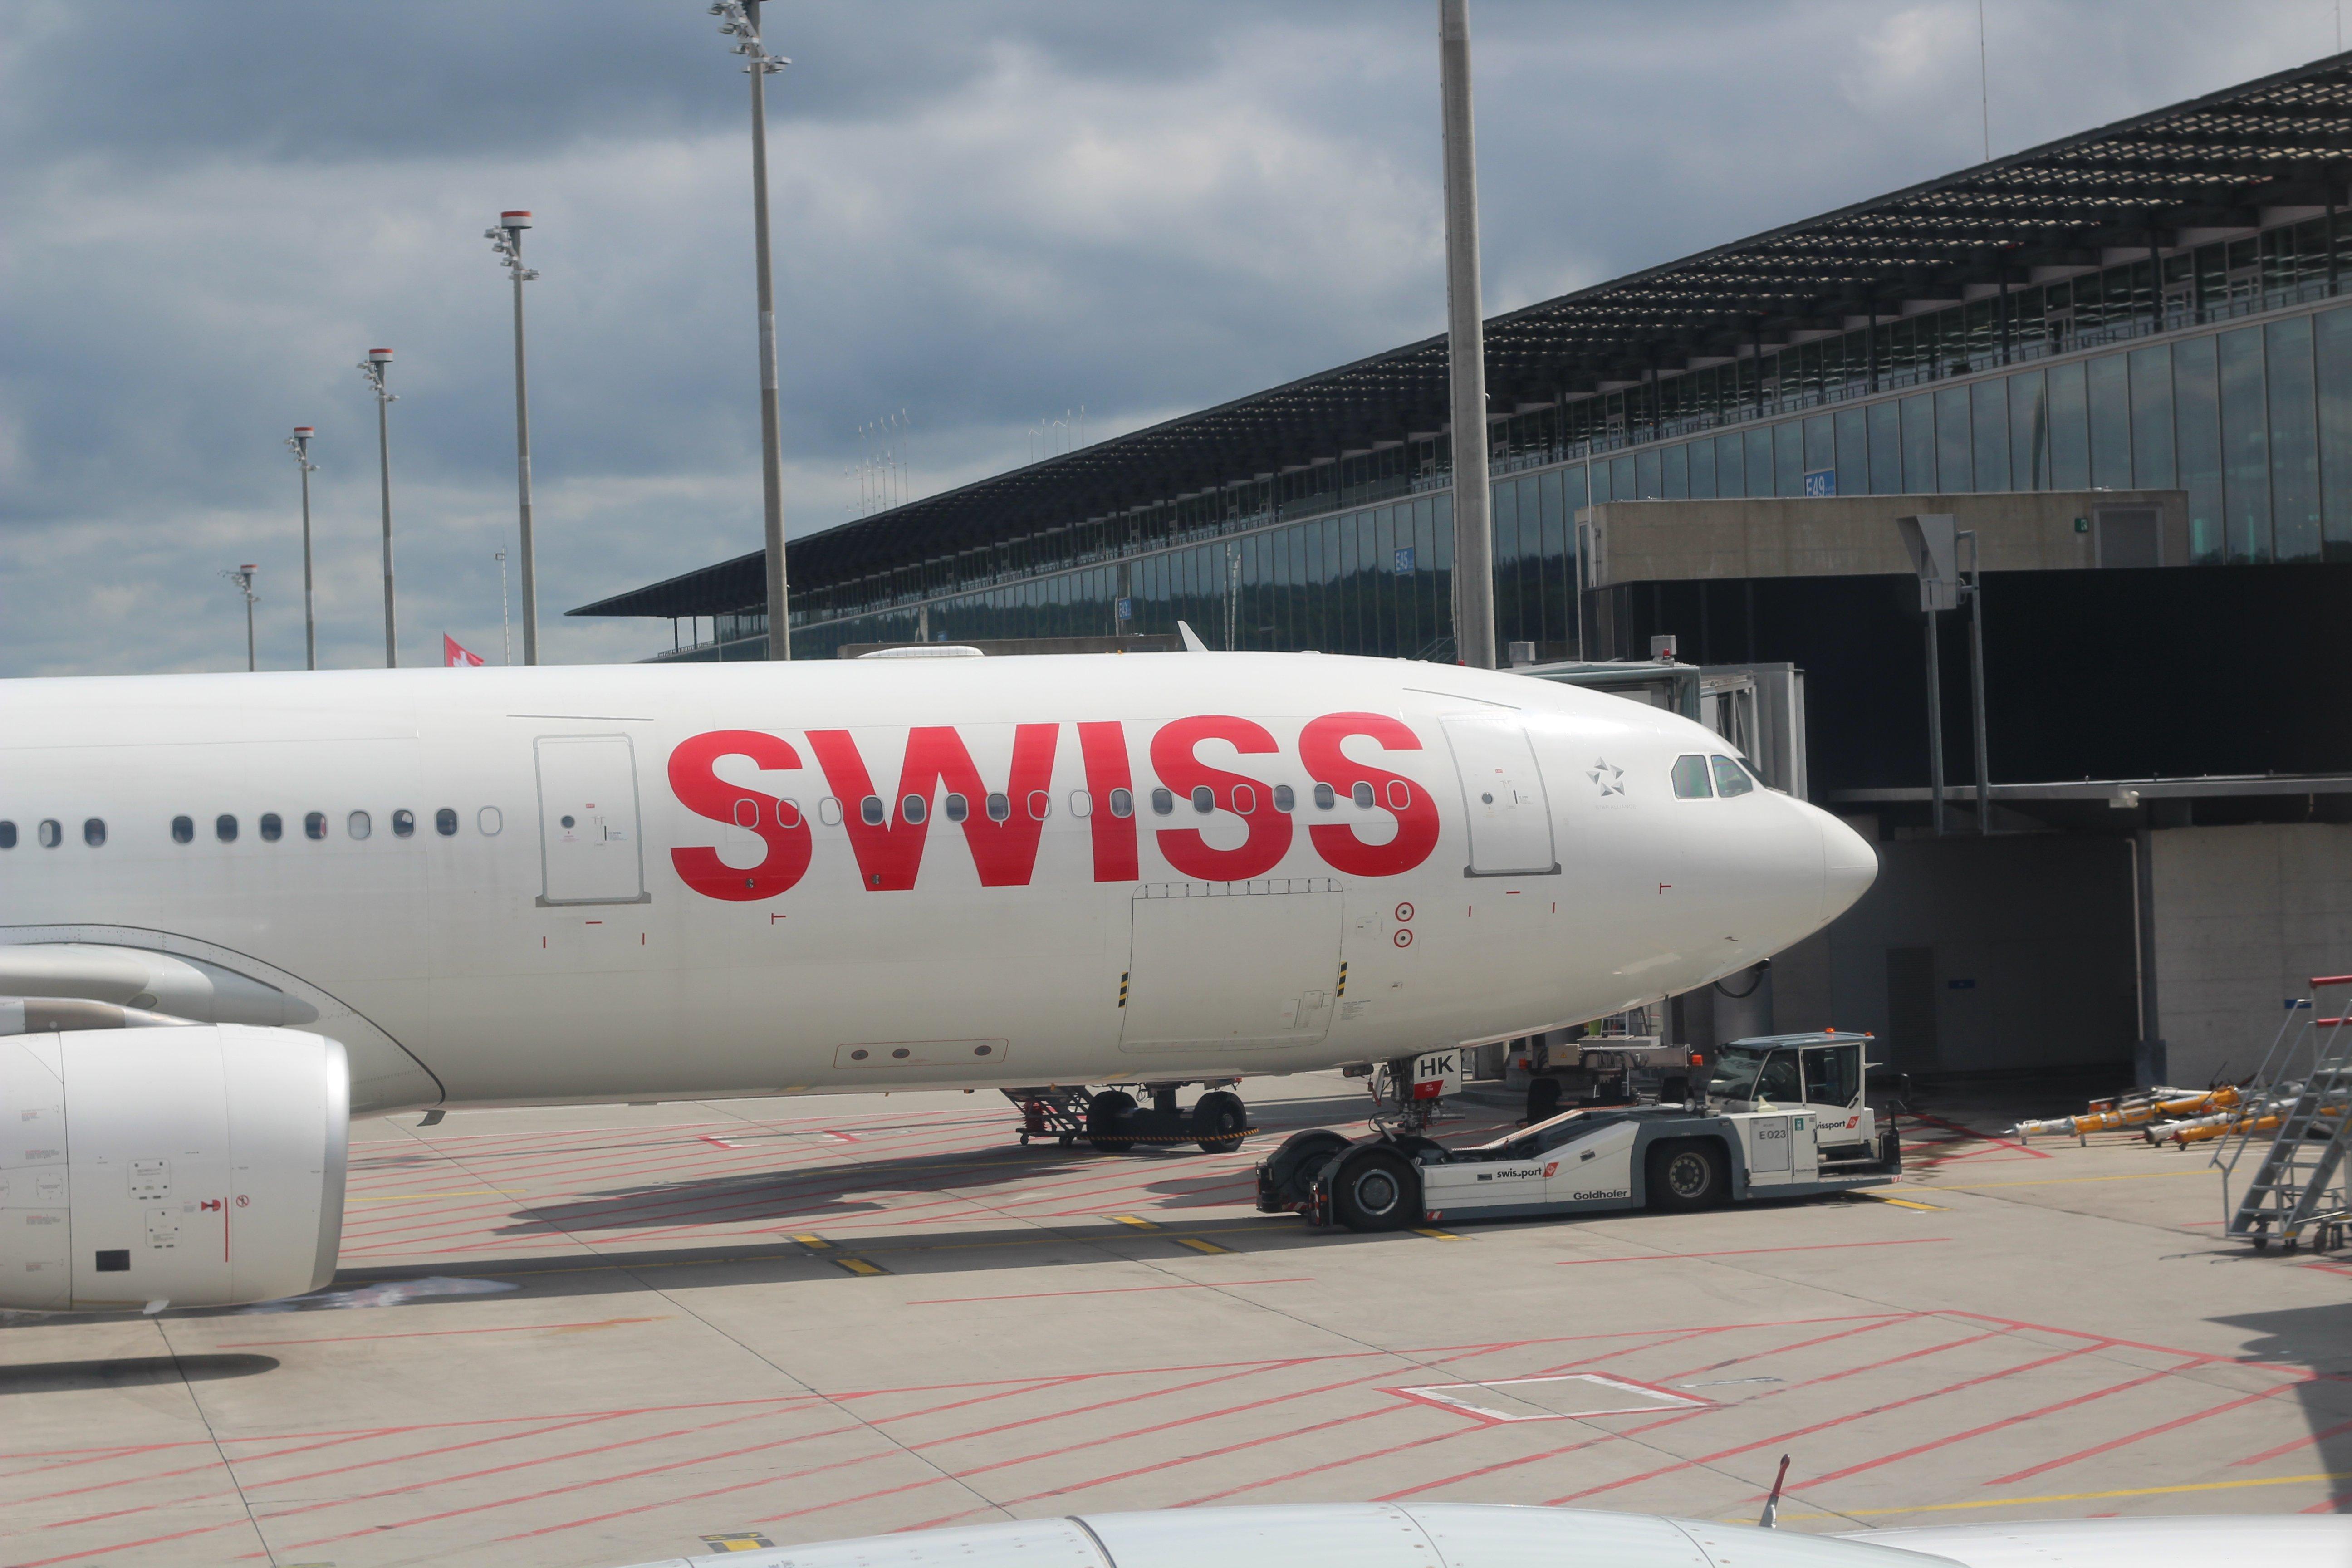 Swiss Business Class Review Zurich (ZRH) to San Francisco (SFO) 777 – August 2019 including Swiss Business Class Lounge Zurich (ZRH) Review